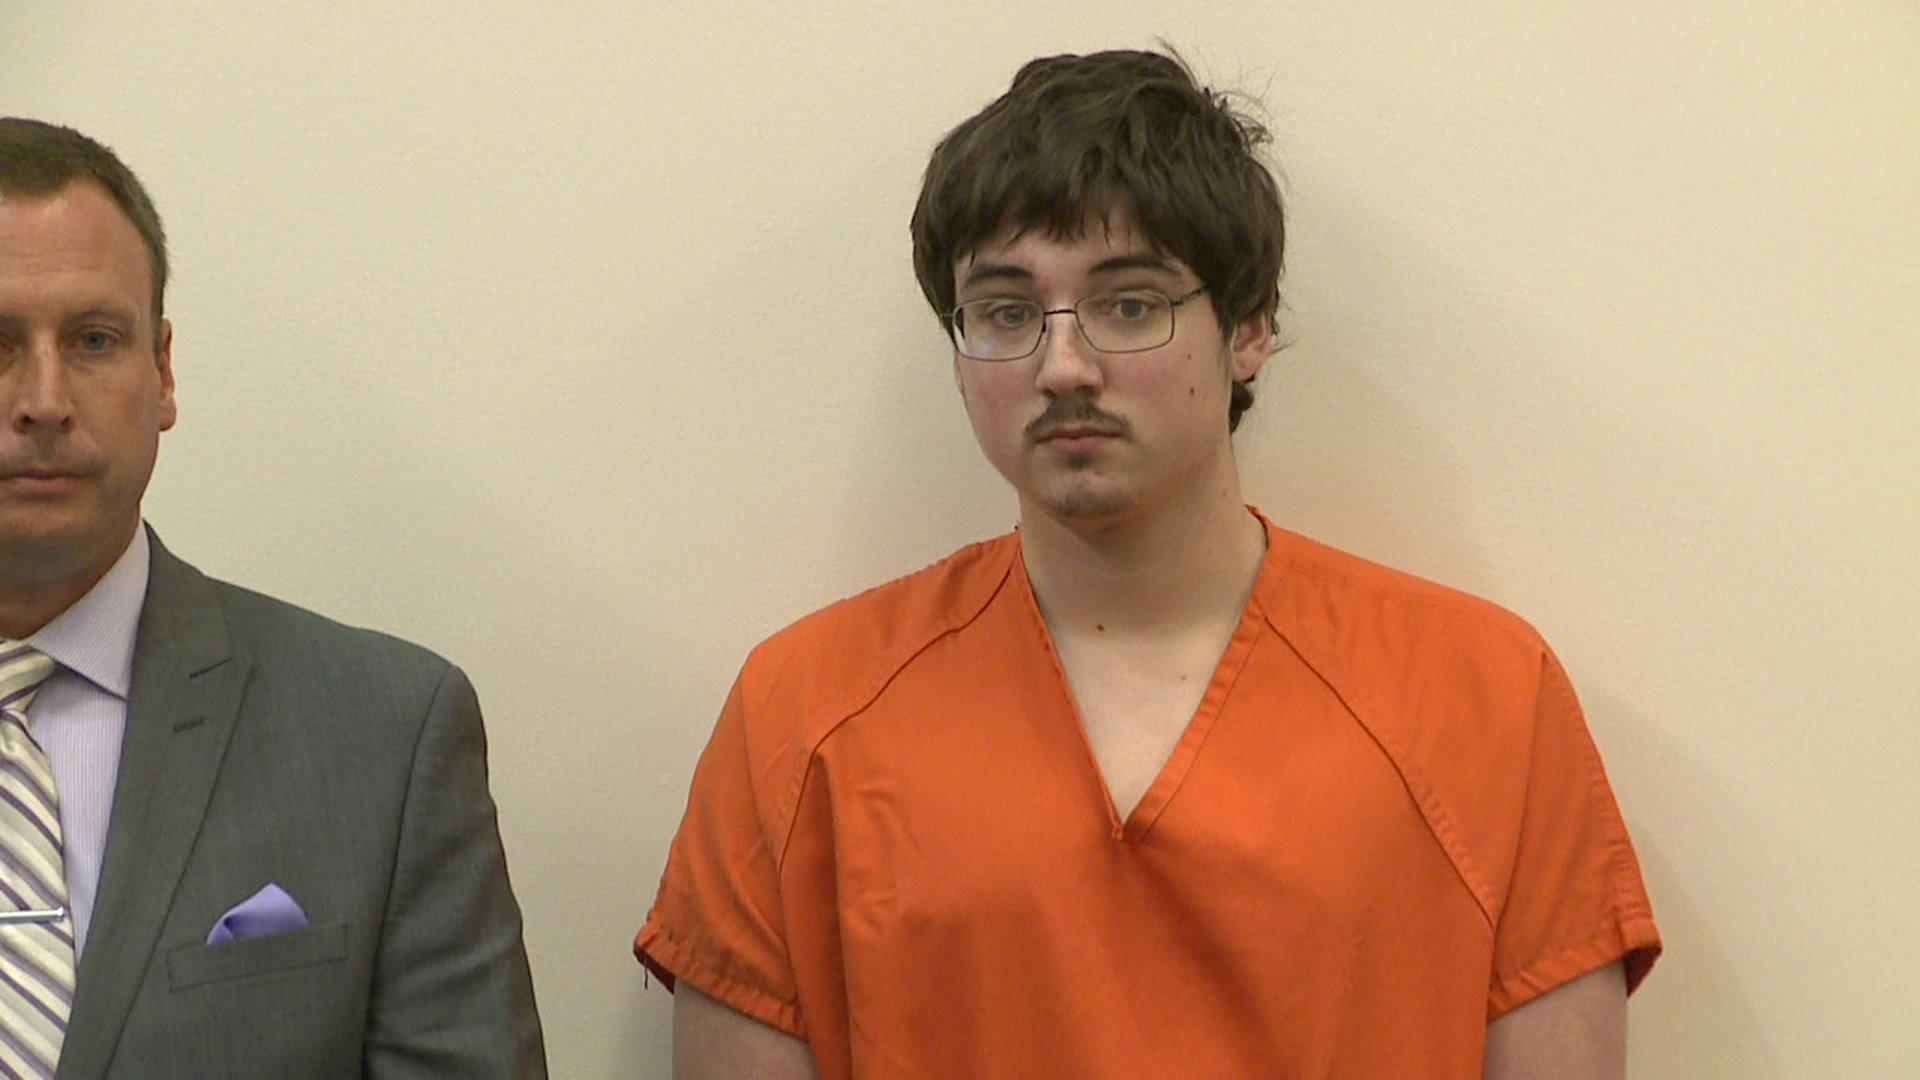 Michigan Man Sentenced to 22 Years For Fatal Road Rage Beating